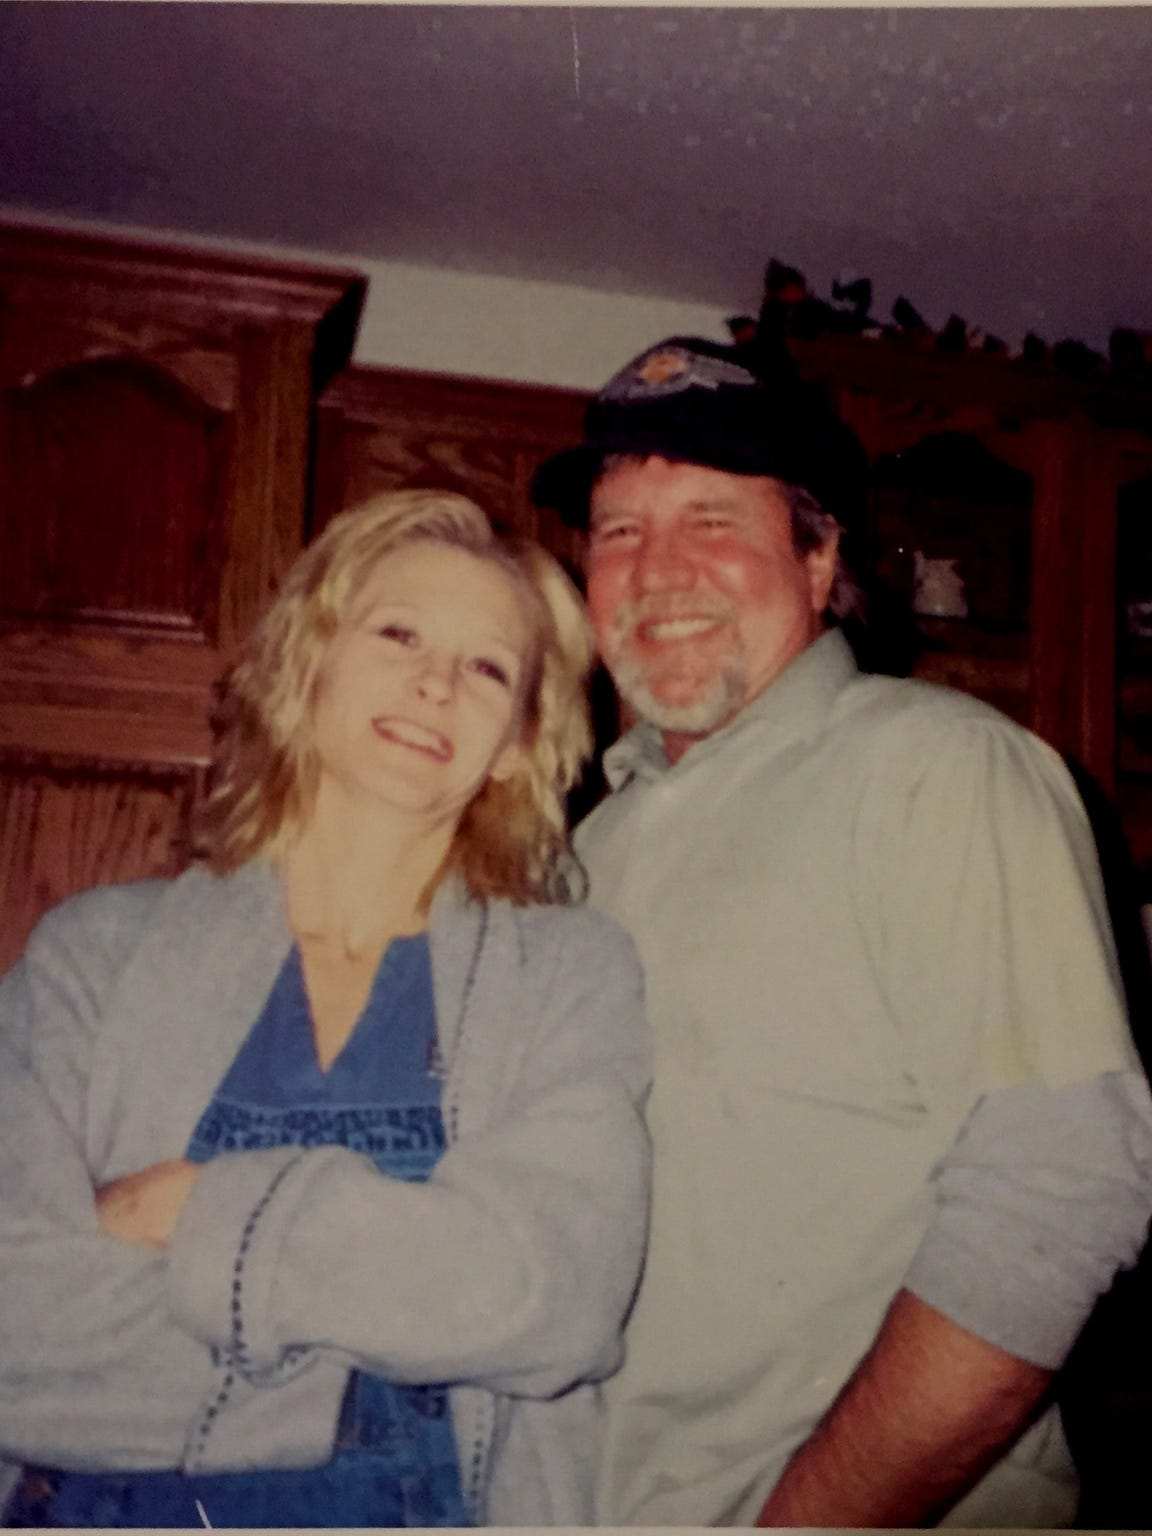 Lisa and Brad Jennings had been married 18 years.